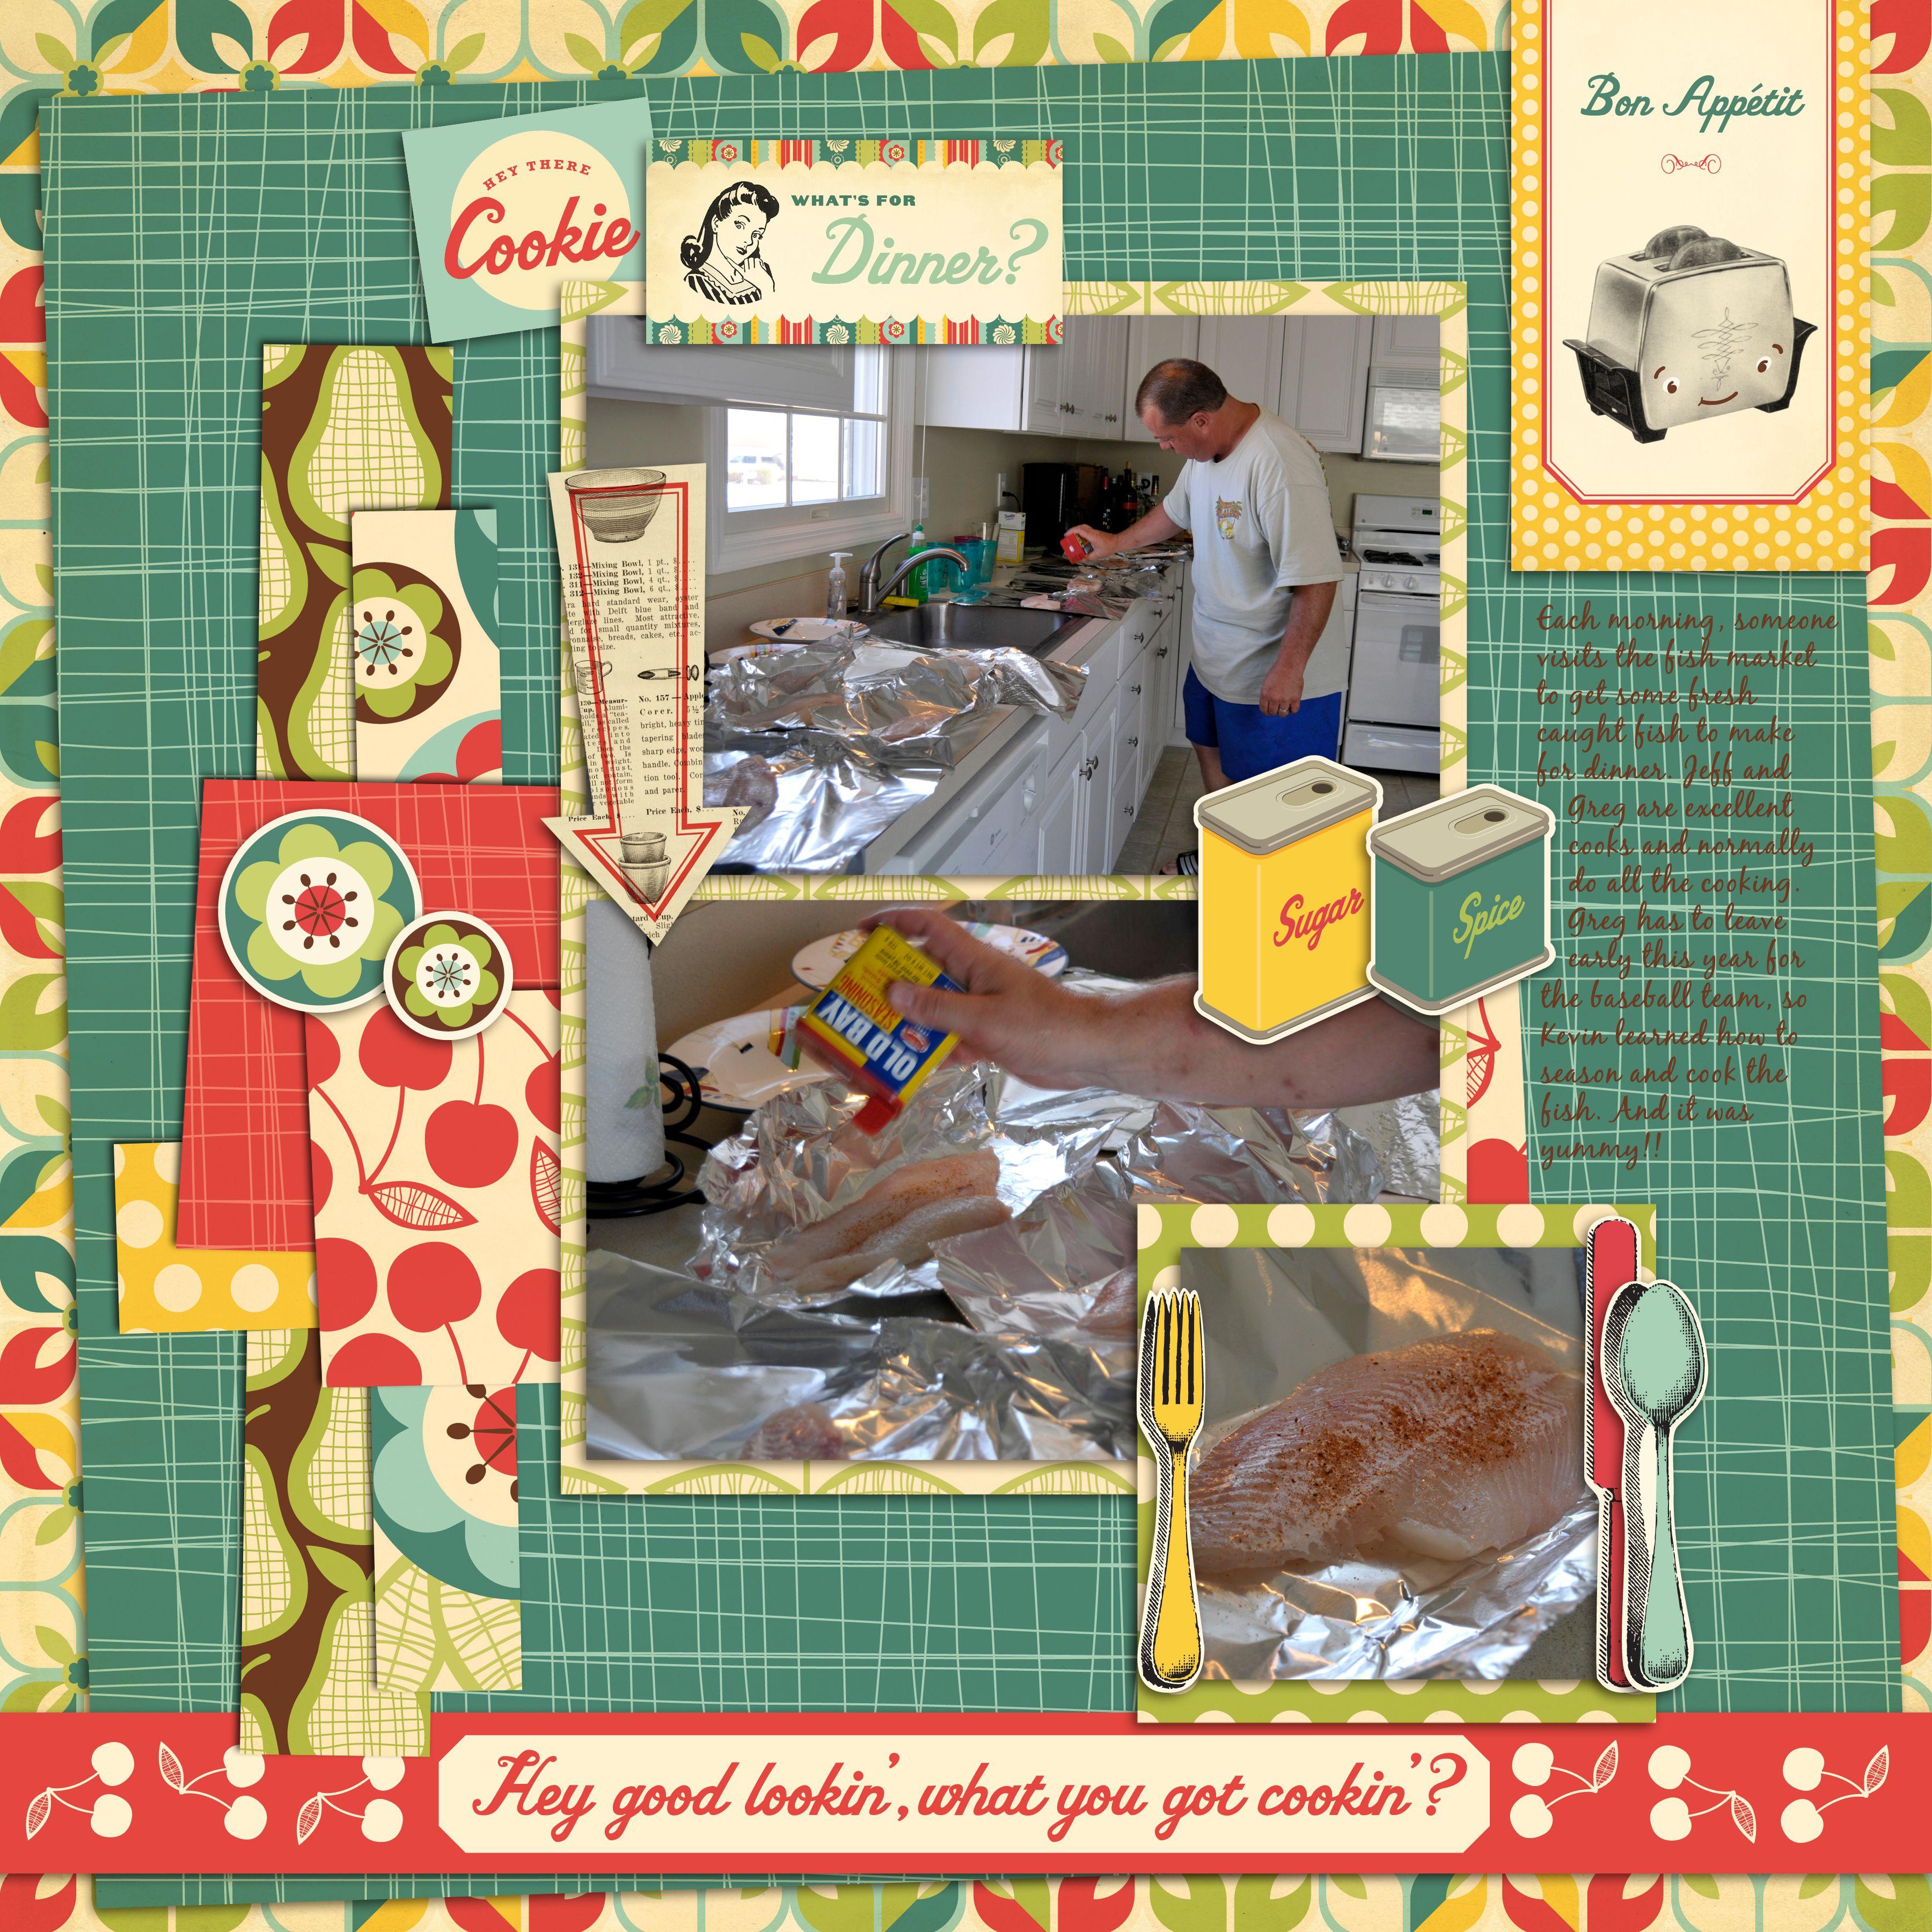 How to scrapbook recipes ideas - Recipe Scrapbook Ideas